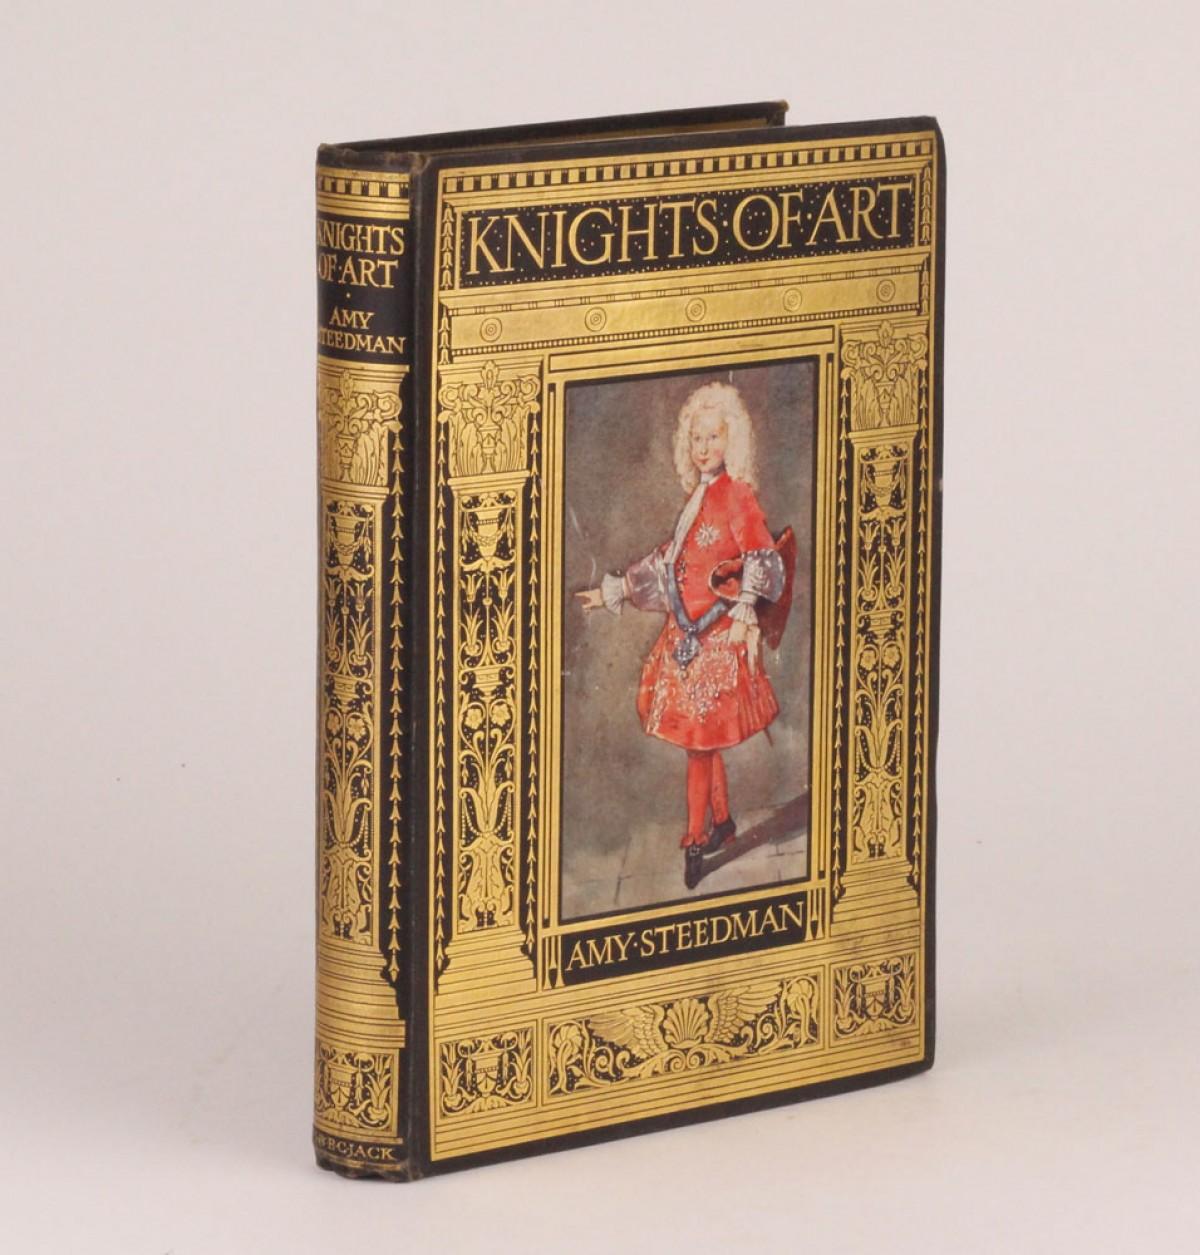 Amy Knights Pics knights of artsteedman, amy / steedman, amy - jonkers